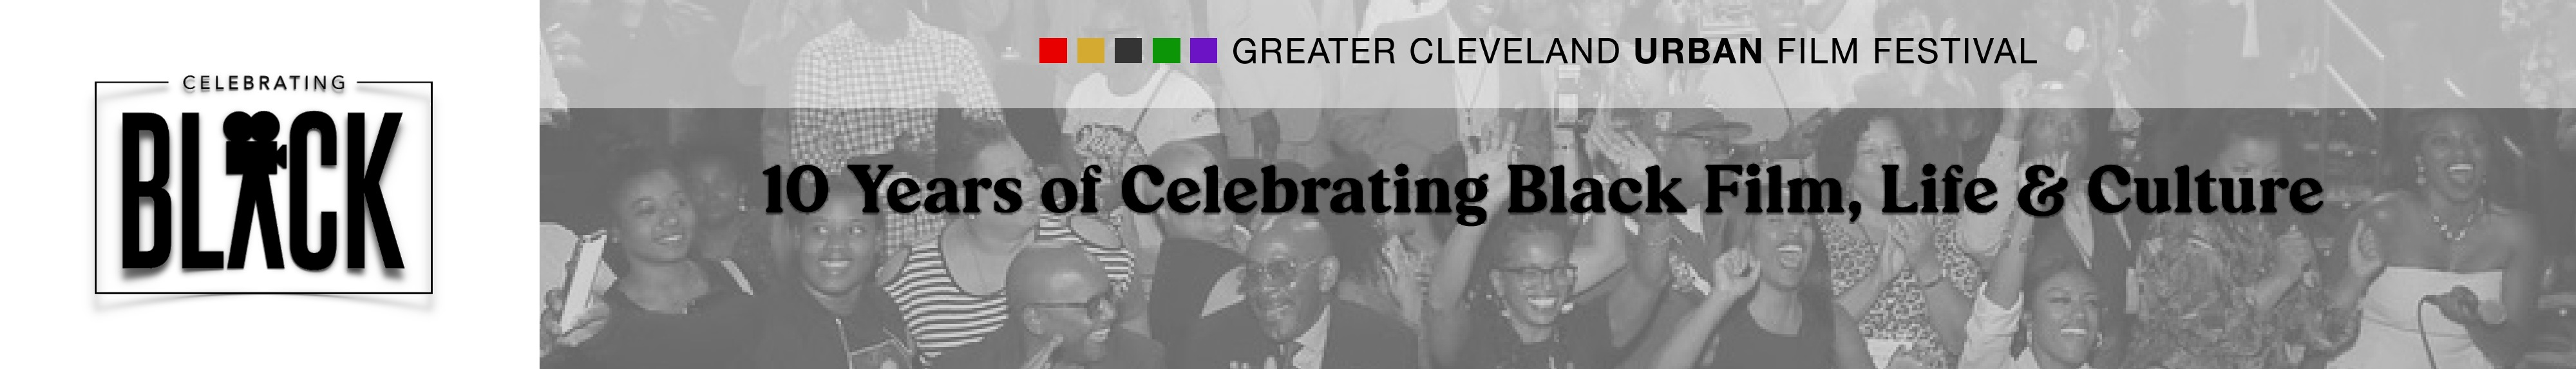 10th Annual Greater Cleveland Urban Film Festival